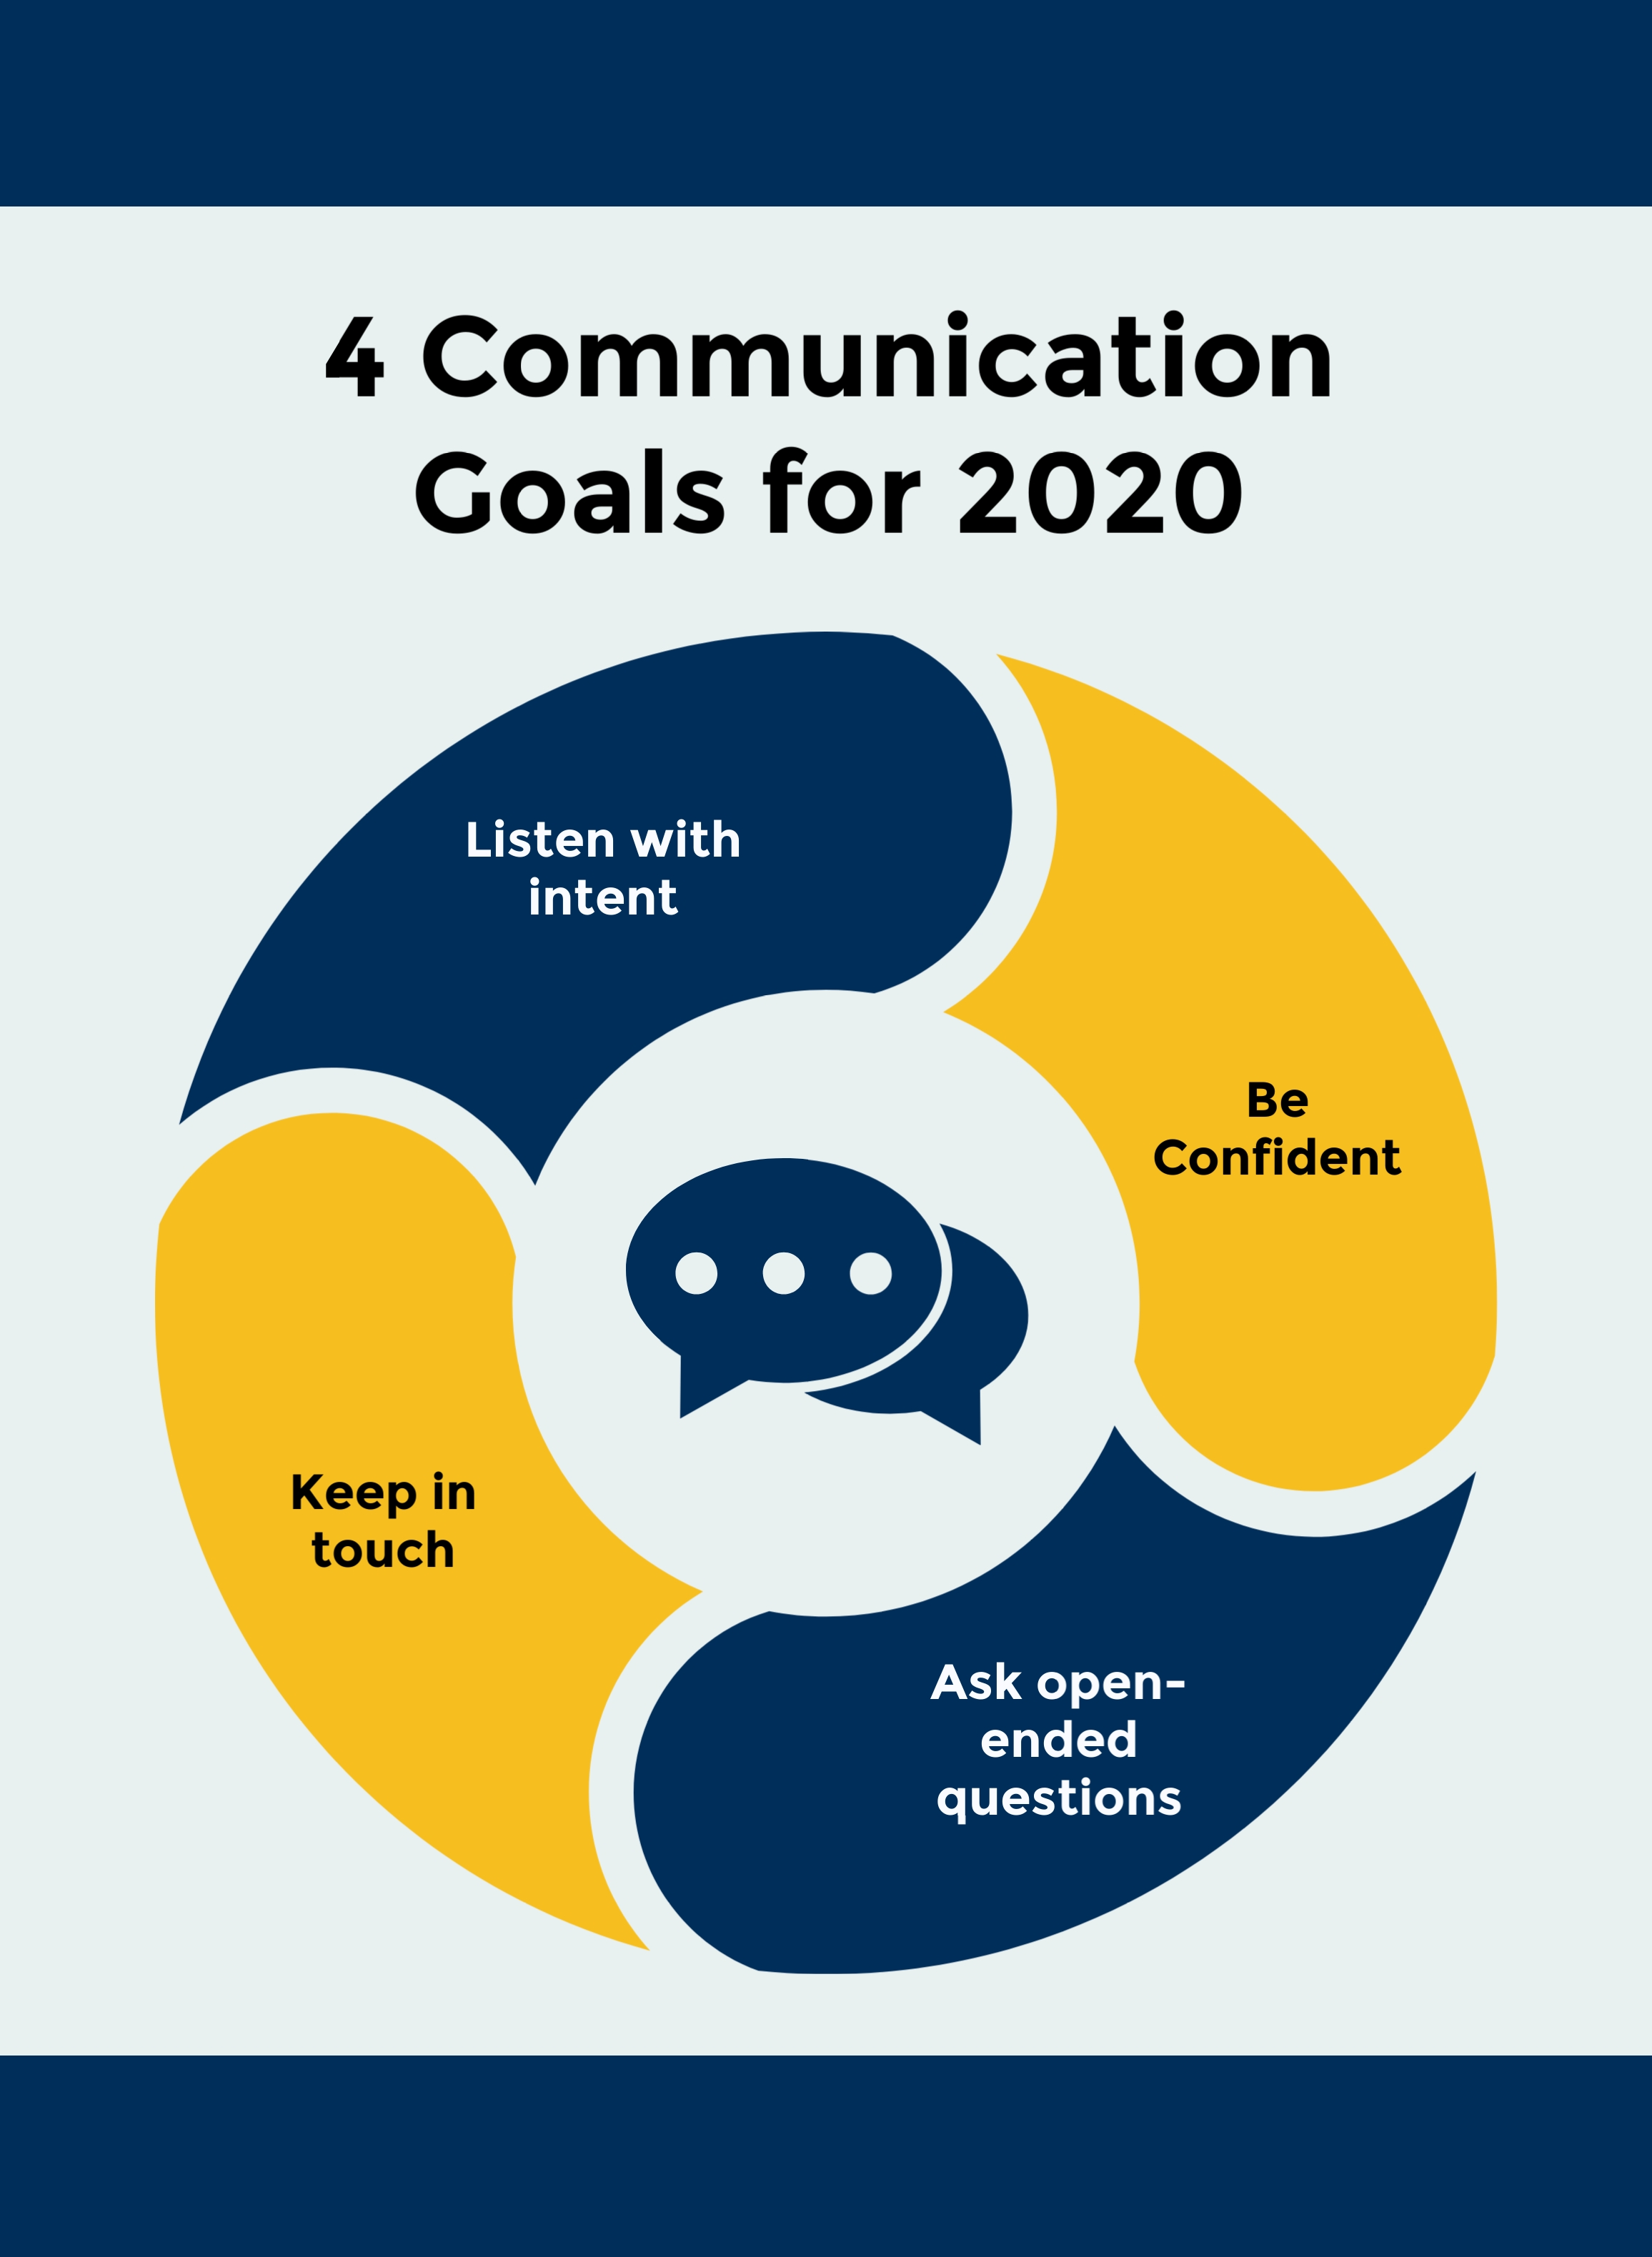 4 Communication Goals to Set for 2020 VoiceLink Communications